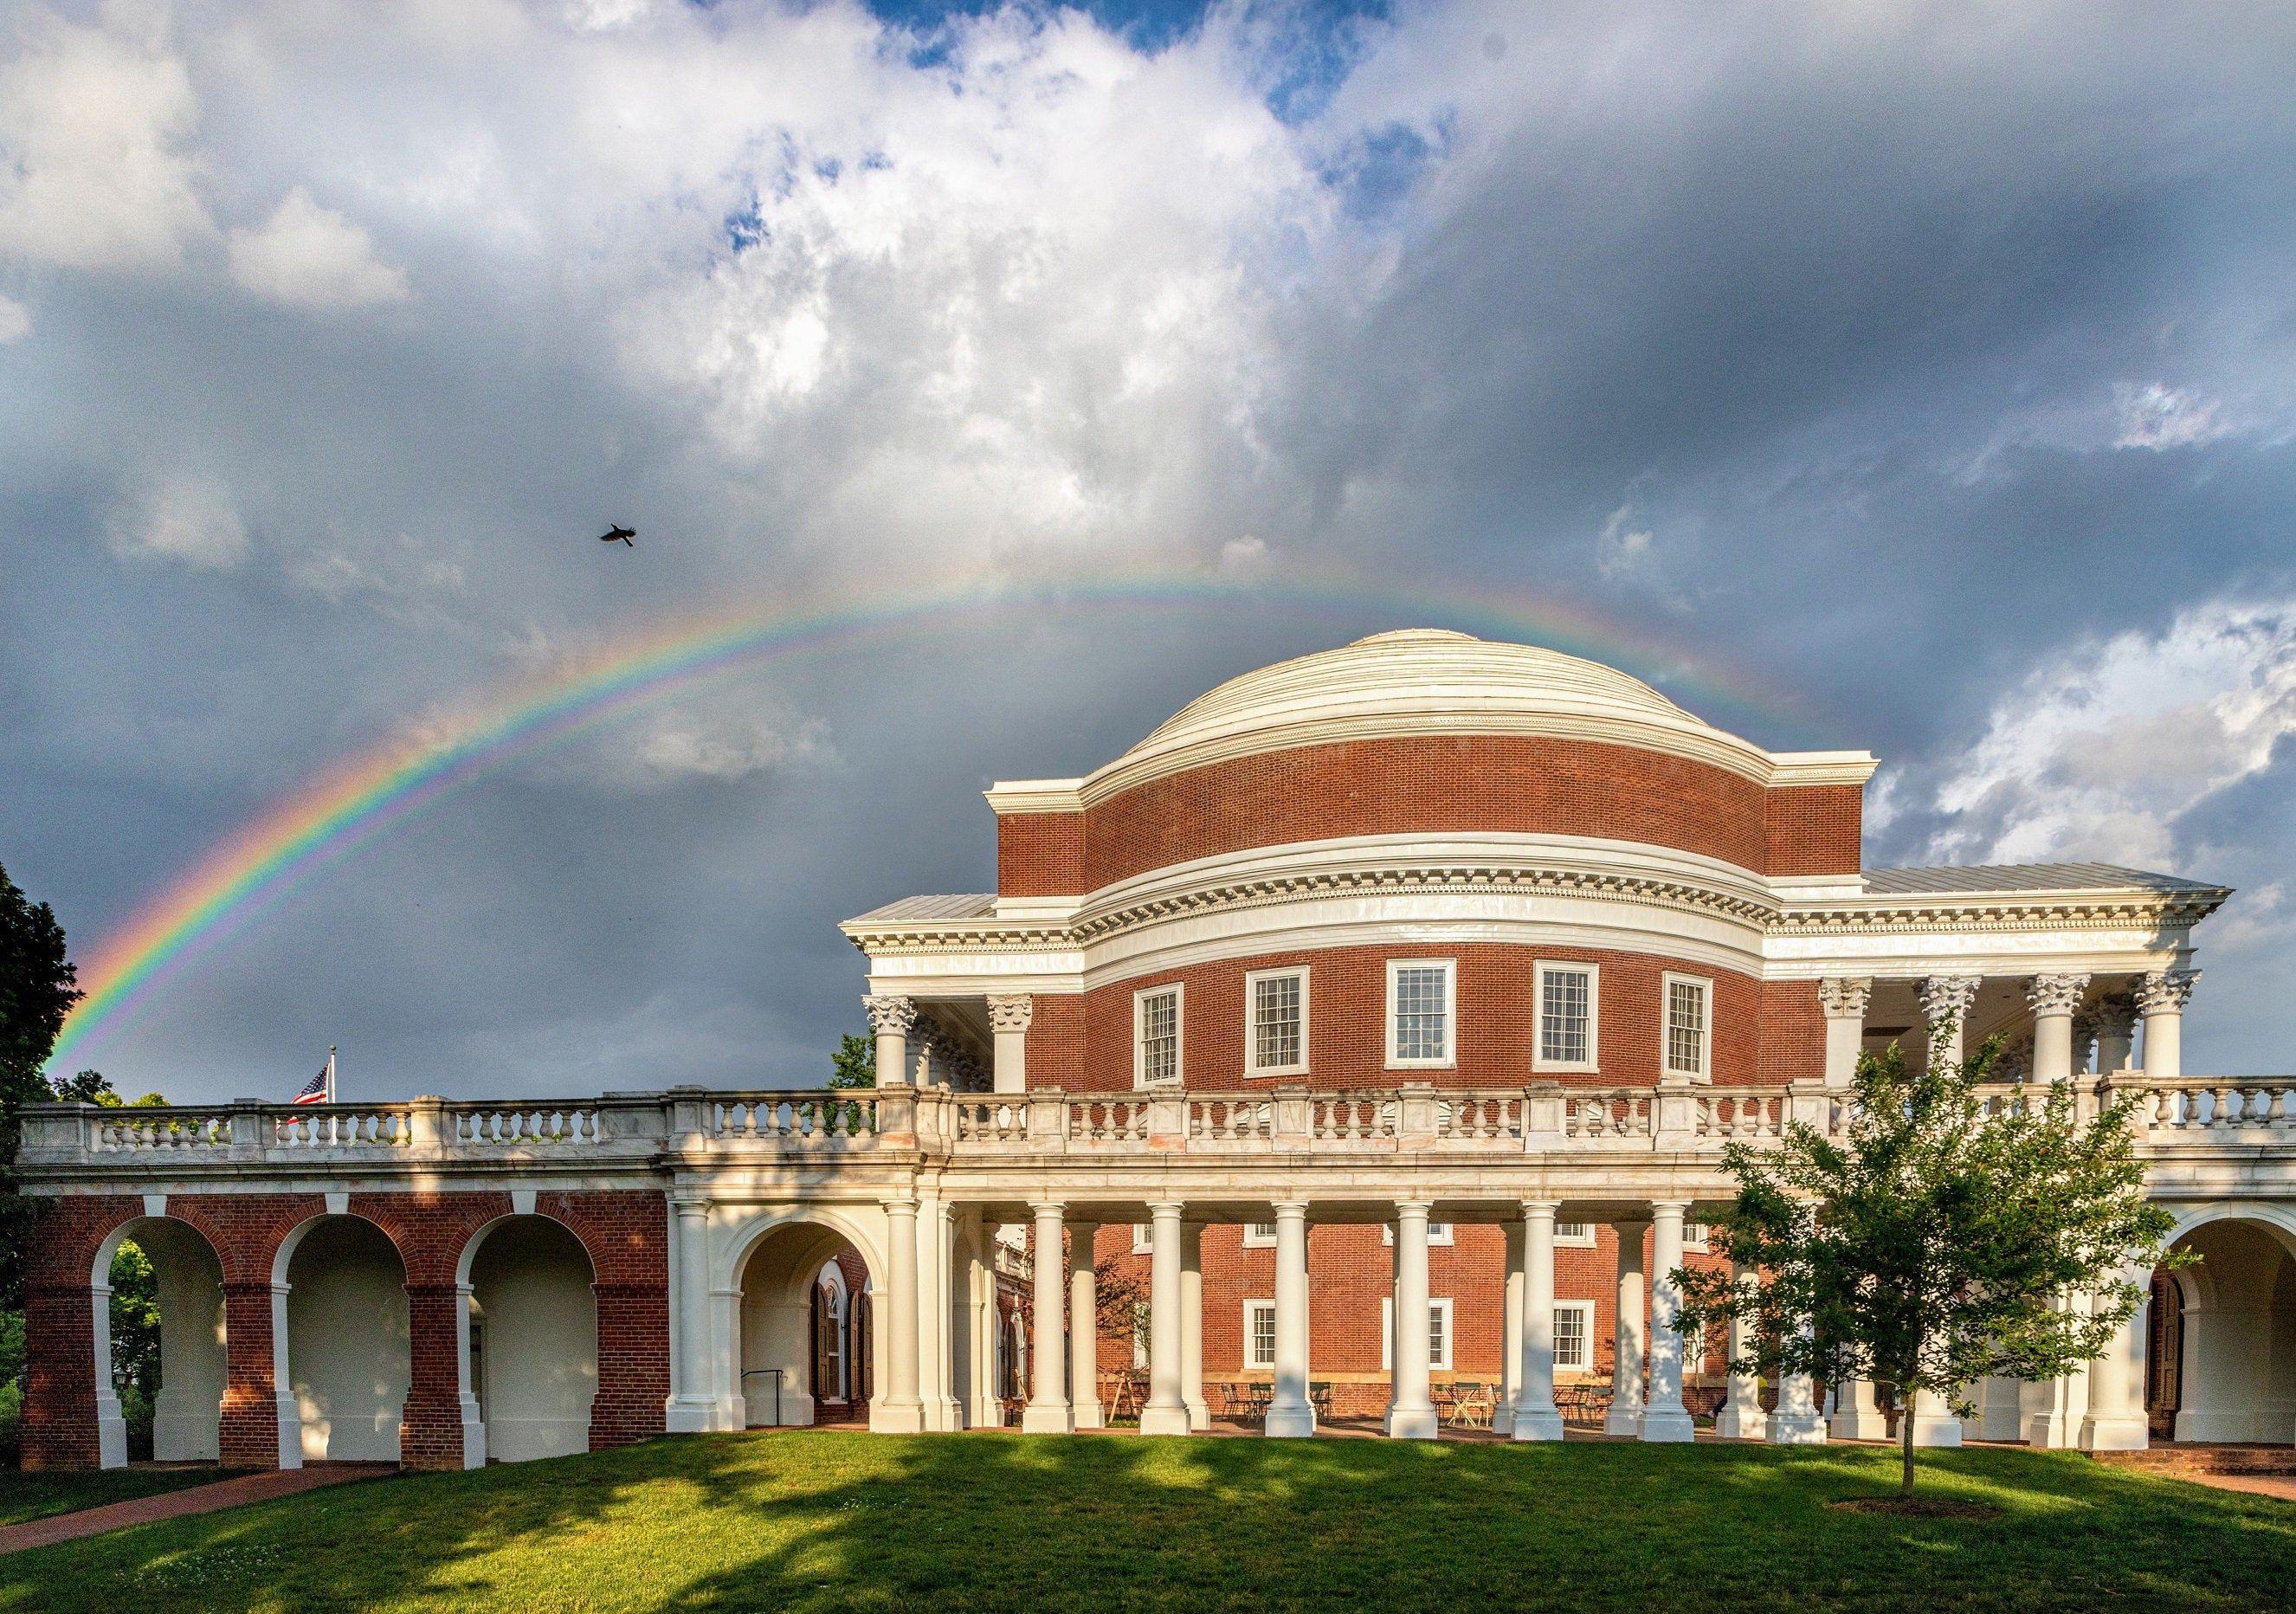 Uva Rotunda Rainbow Picture 5x7 Matted Photo Uva Etsy In 2020 Rainbow Pictures University Of Virginia Virginia Fall